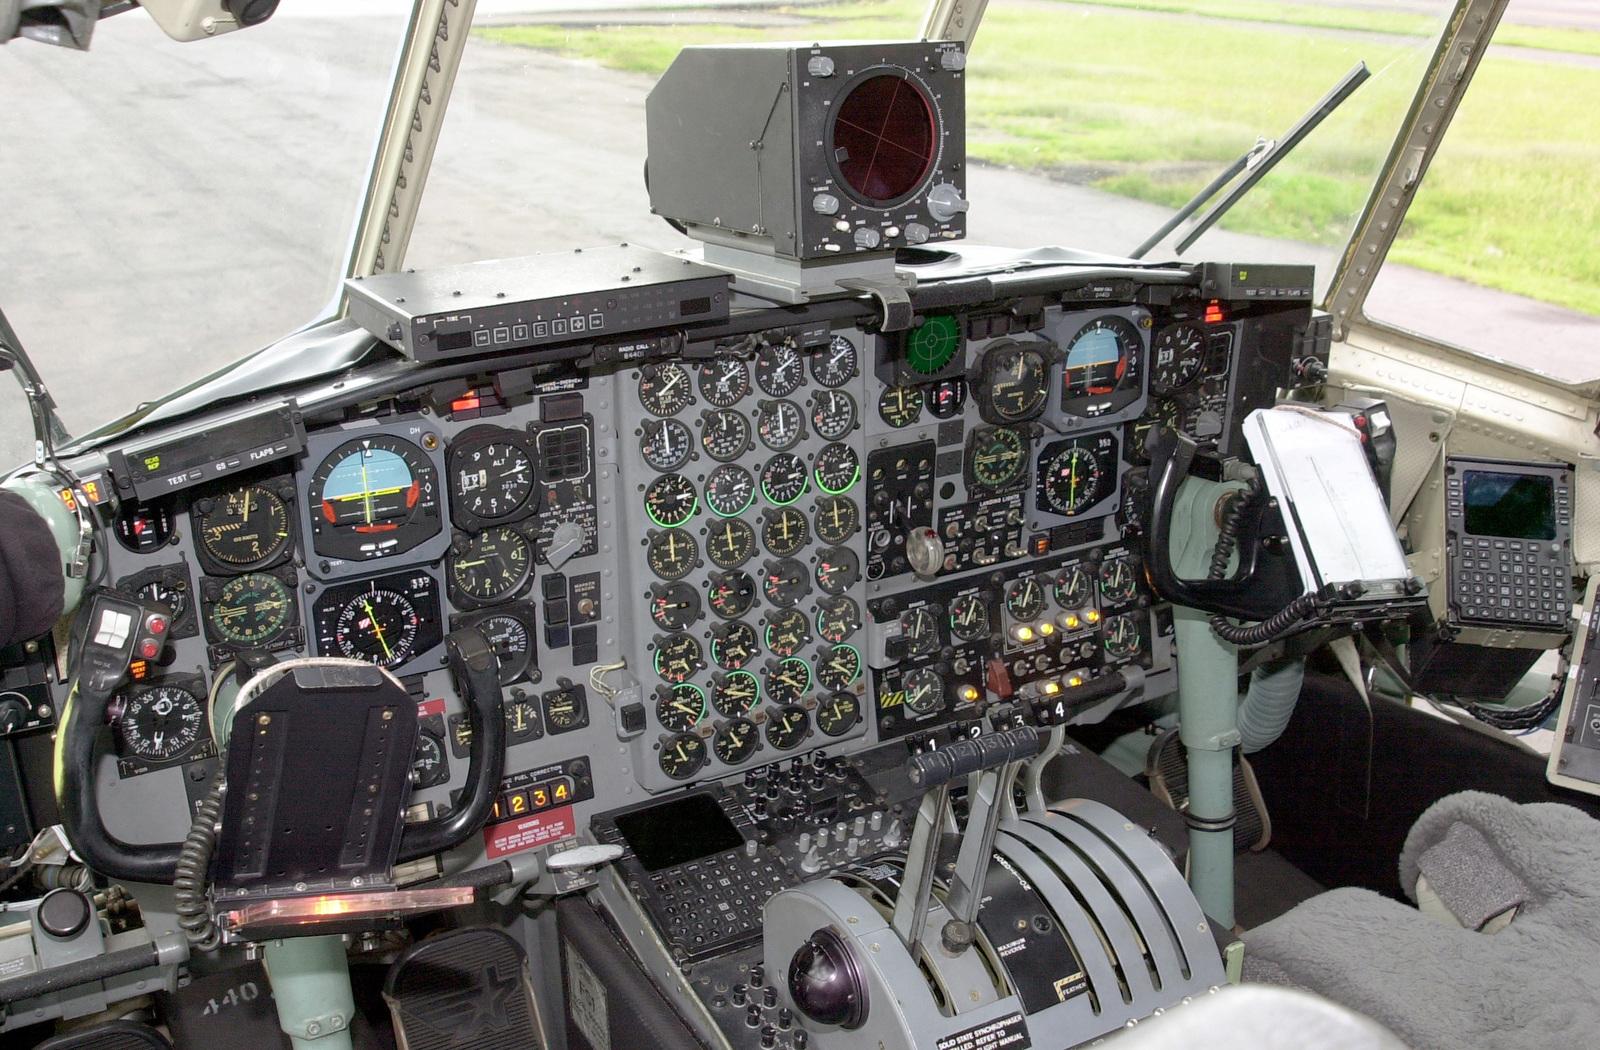 Interior cockpit view of a US Air Force C-130 Hercules